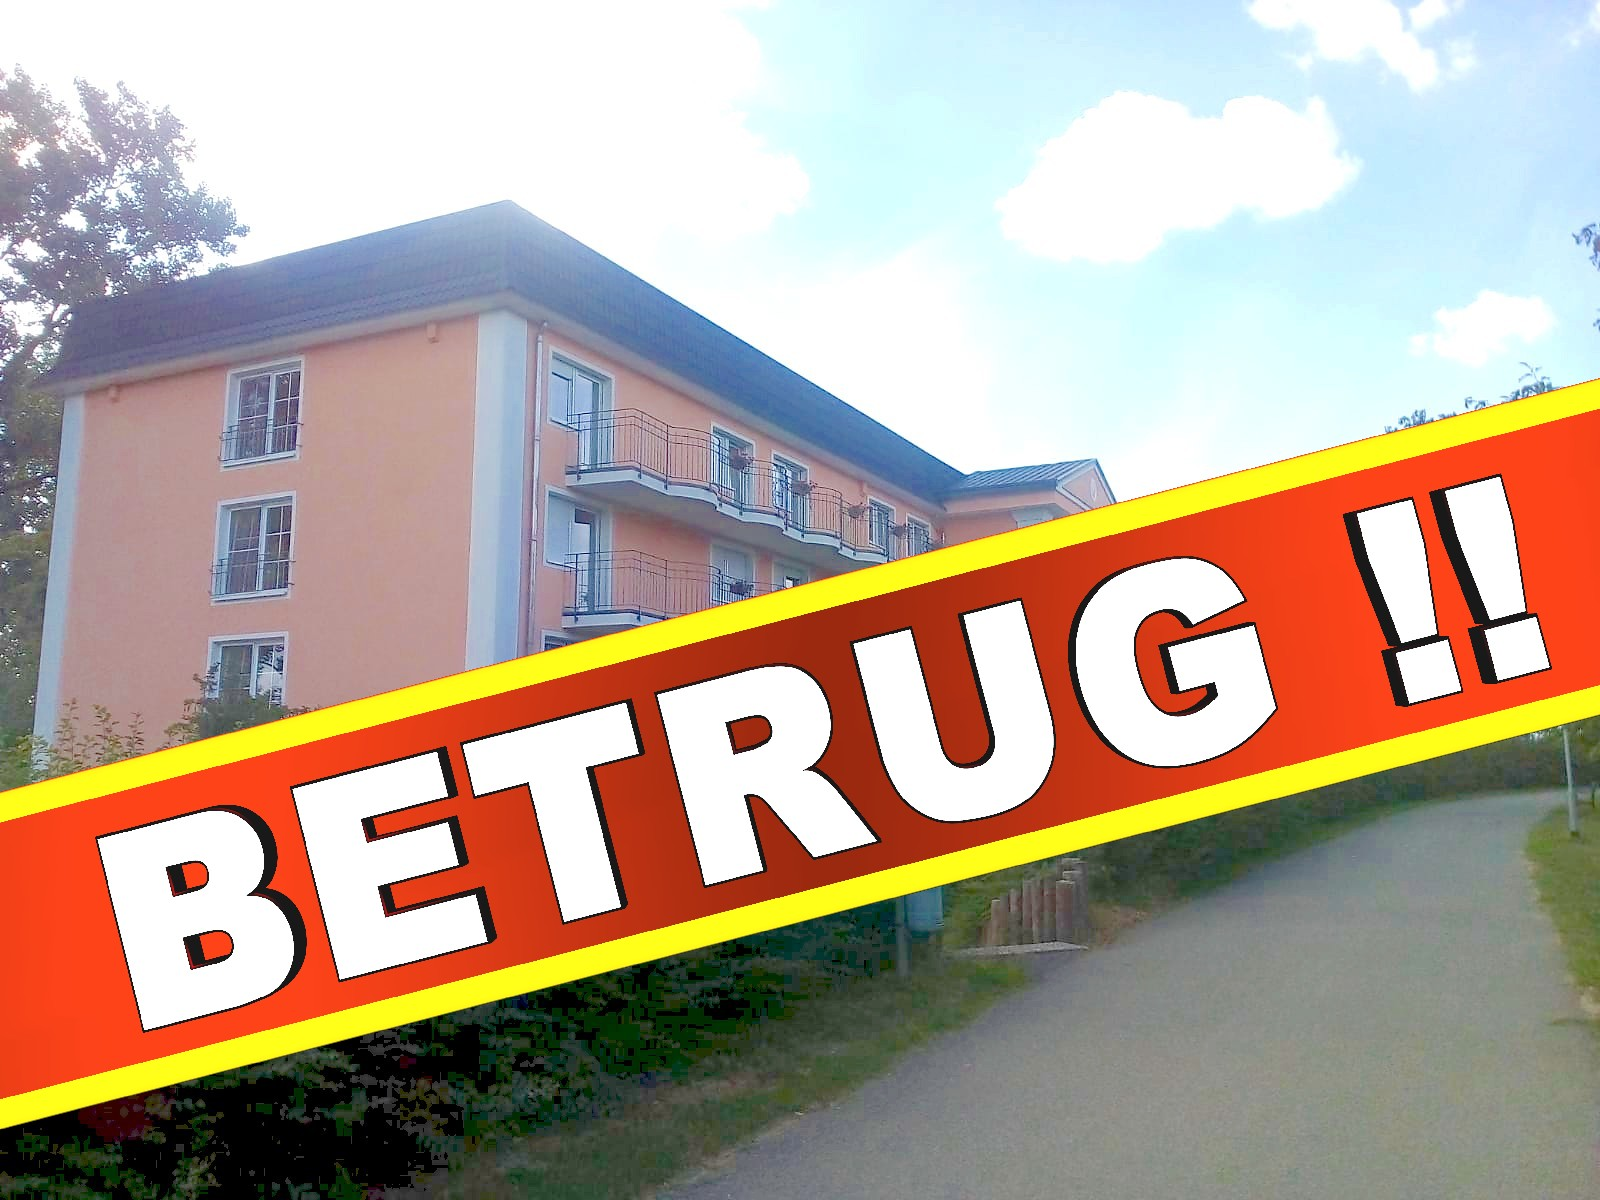 Bezirksklinikum Obermain Kutzenberg, 96250 Ebensfeld Psychiatrie Polizei Krankenhaus (54)